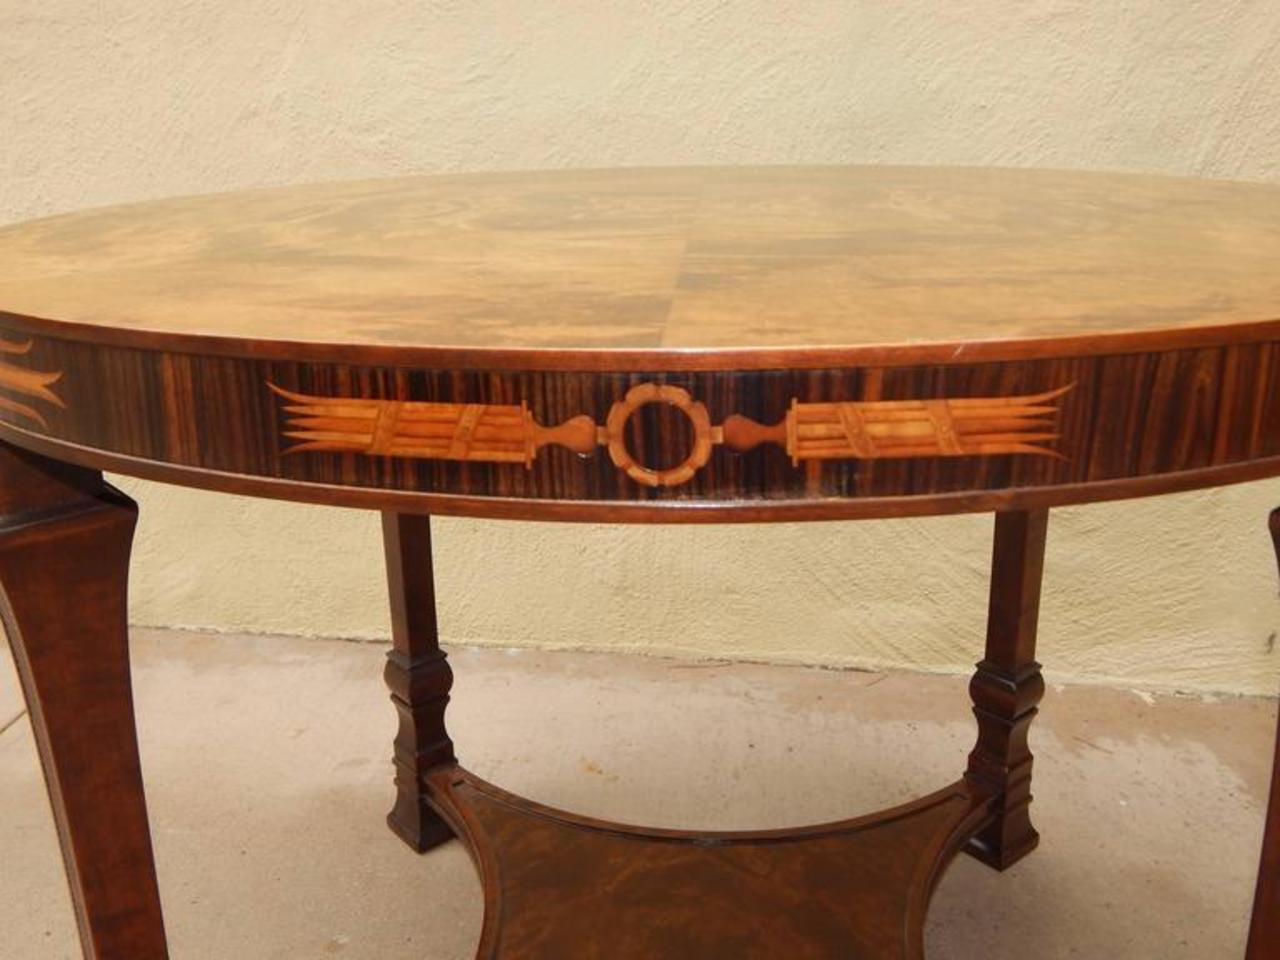 Swedish Art Deco Inlaid Table-Carl Malmsten for Smf, circa ...